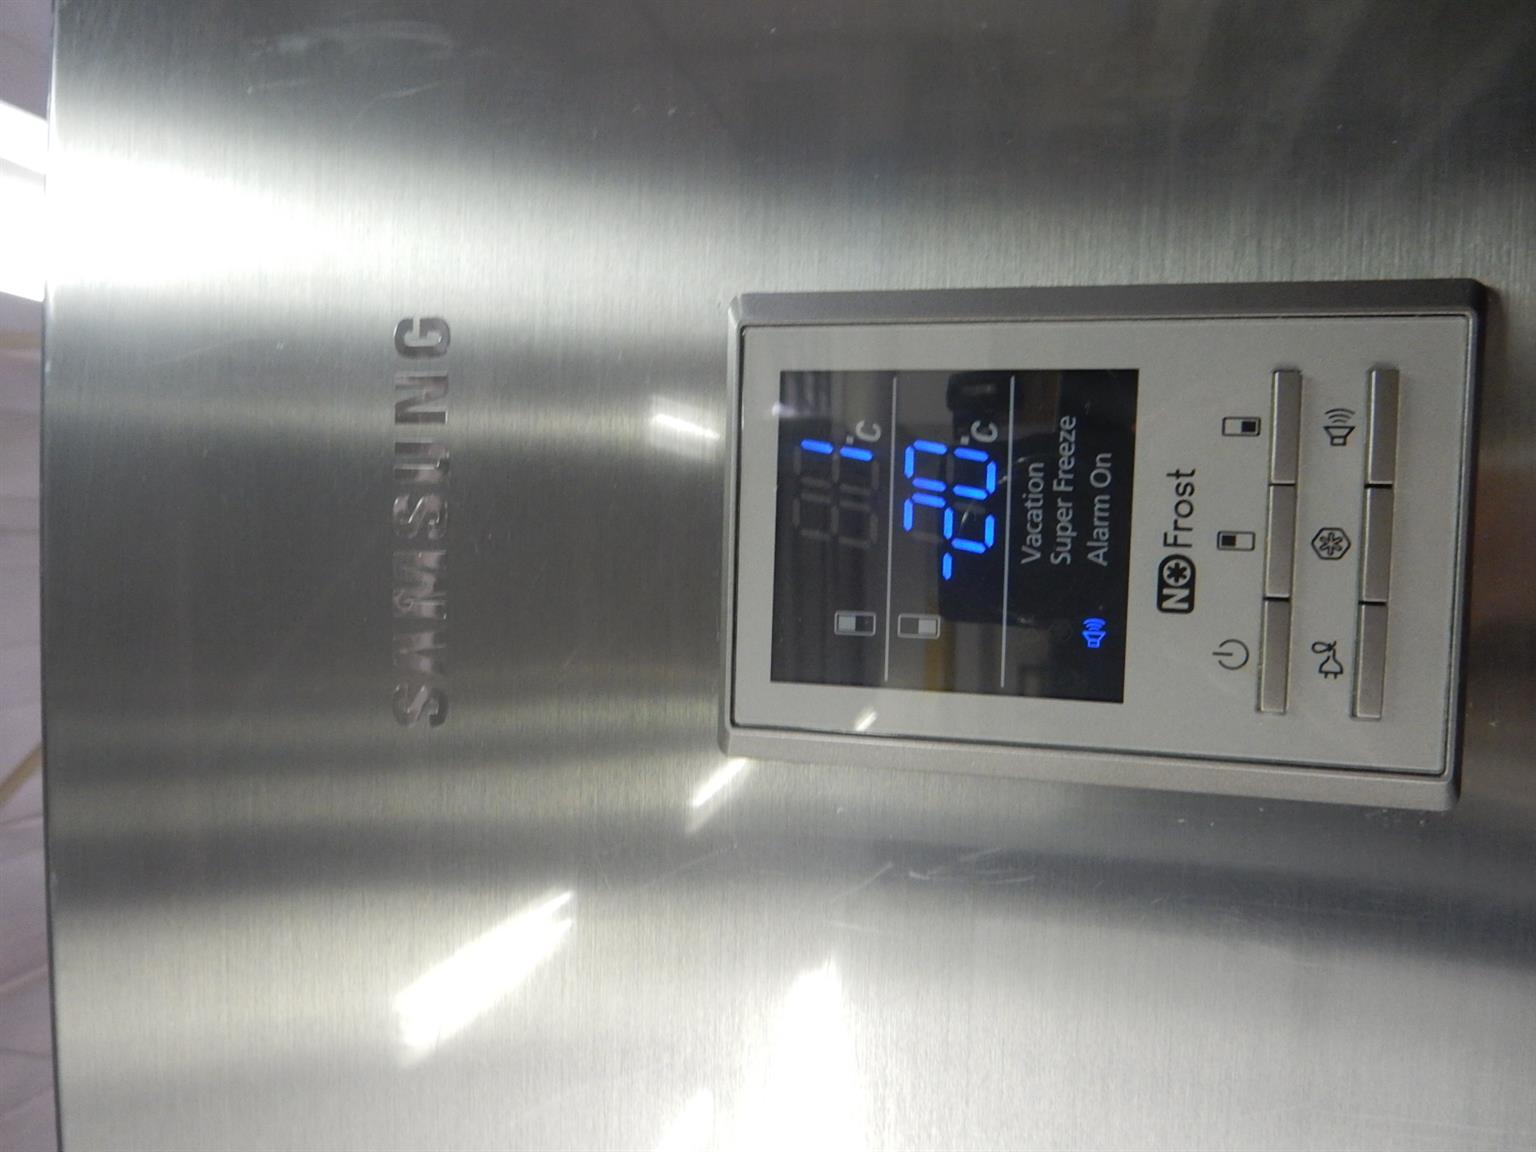 Samsung Fridge / Freezer